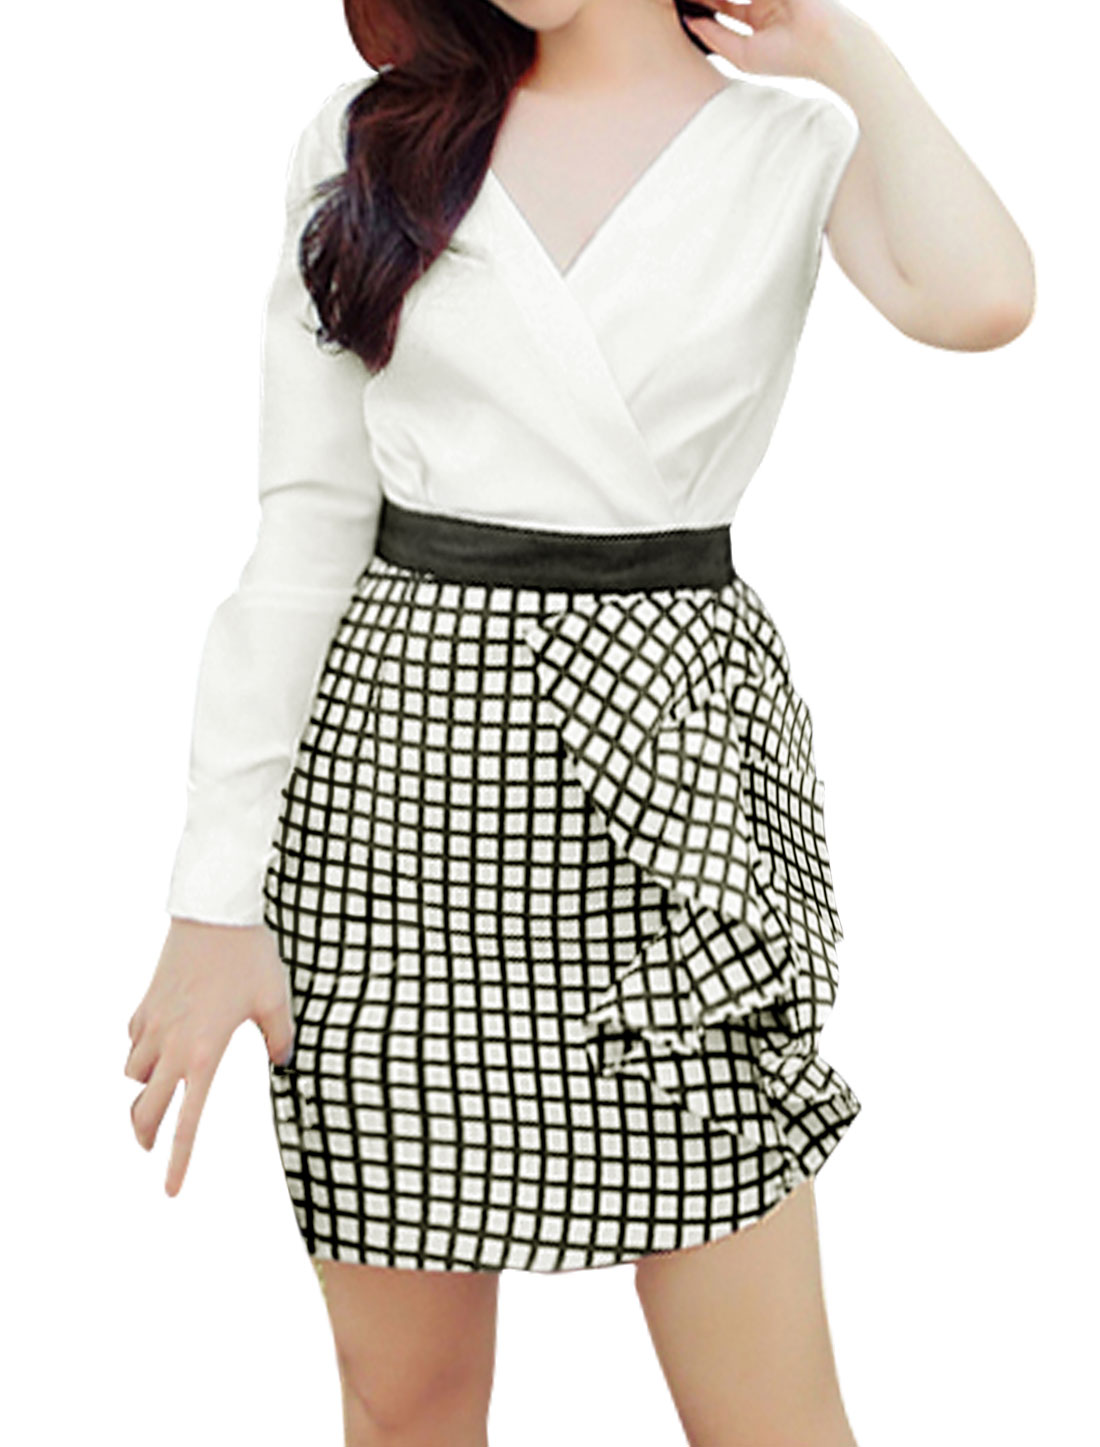 Women One Long Sleeves Plaids Panel Flouncing Decor Mini Sheath Dress White S